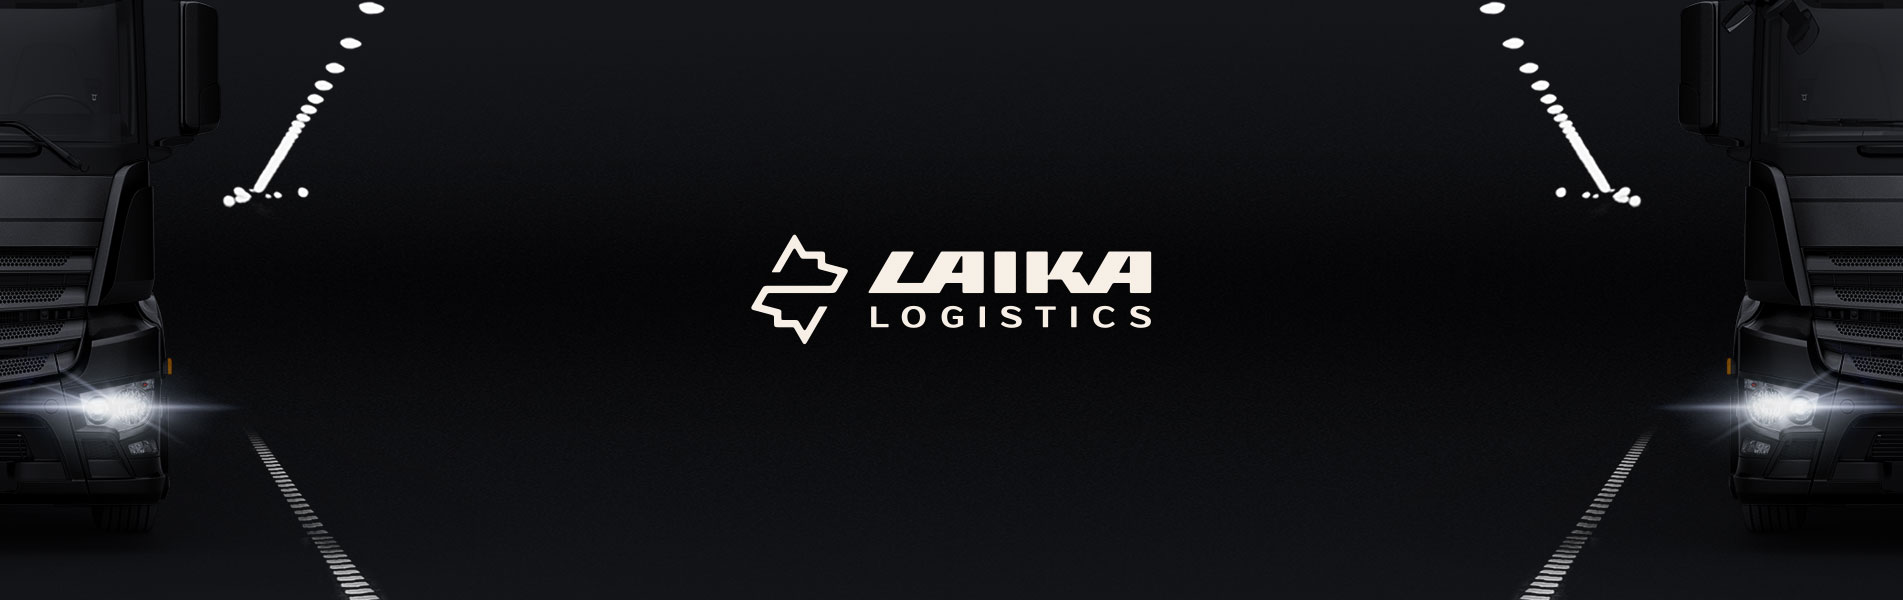 Laika Logistics